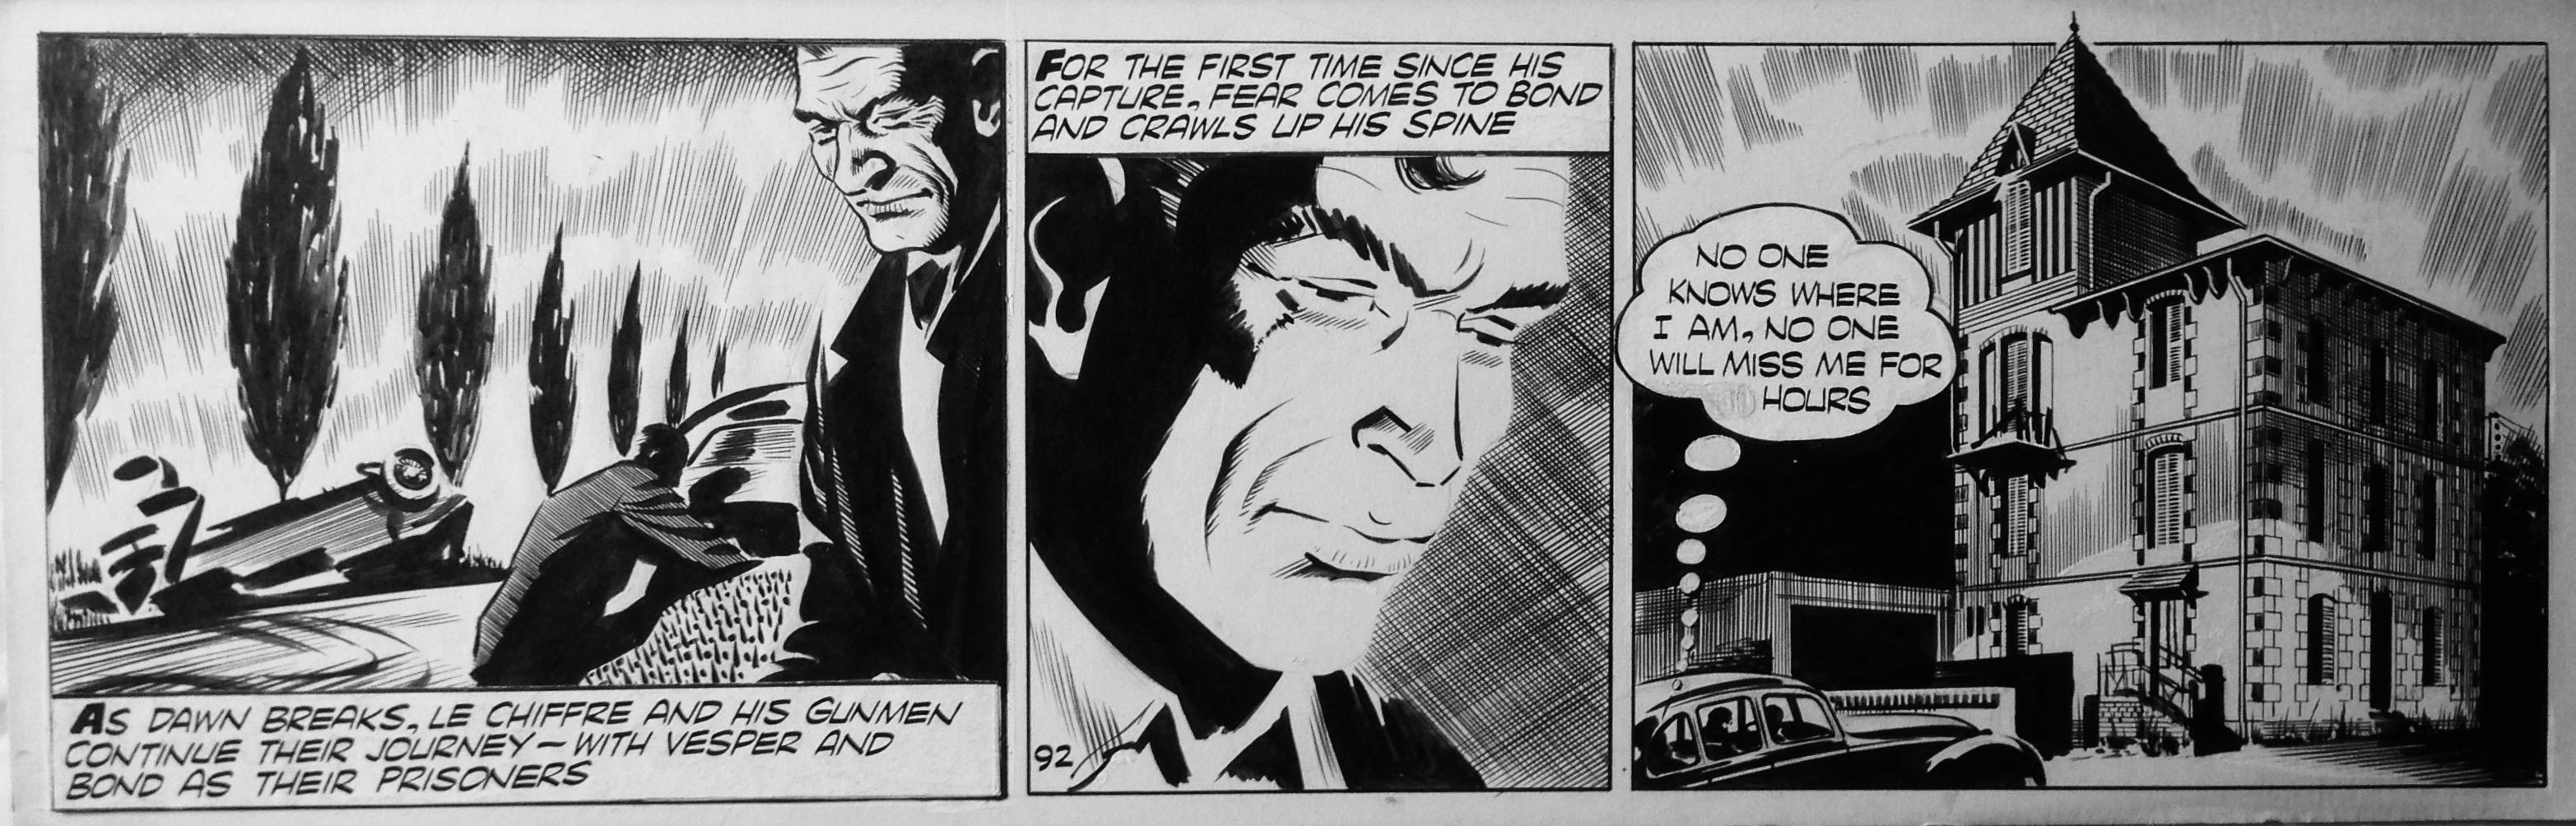 Strip original n° 92 pour Casino Royale (dessin de McLusky - octobre 1958)